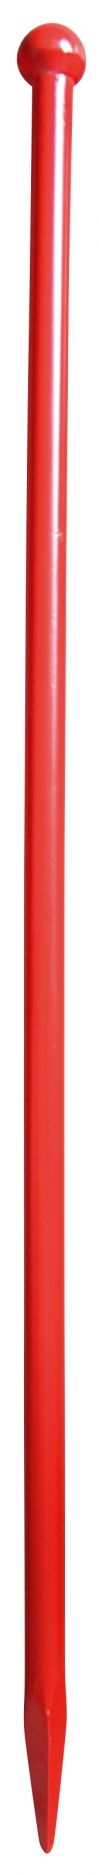 Breekstang rond Ø 28 mm - Bol/punt - 1200 mm